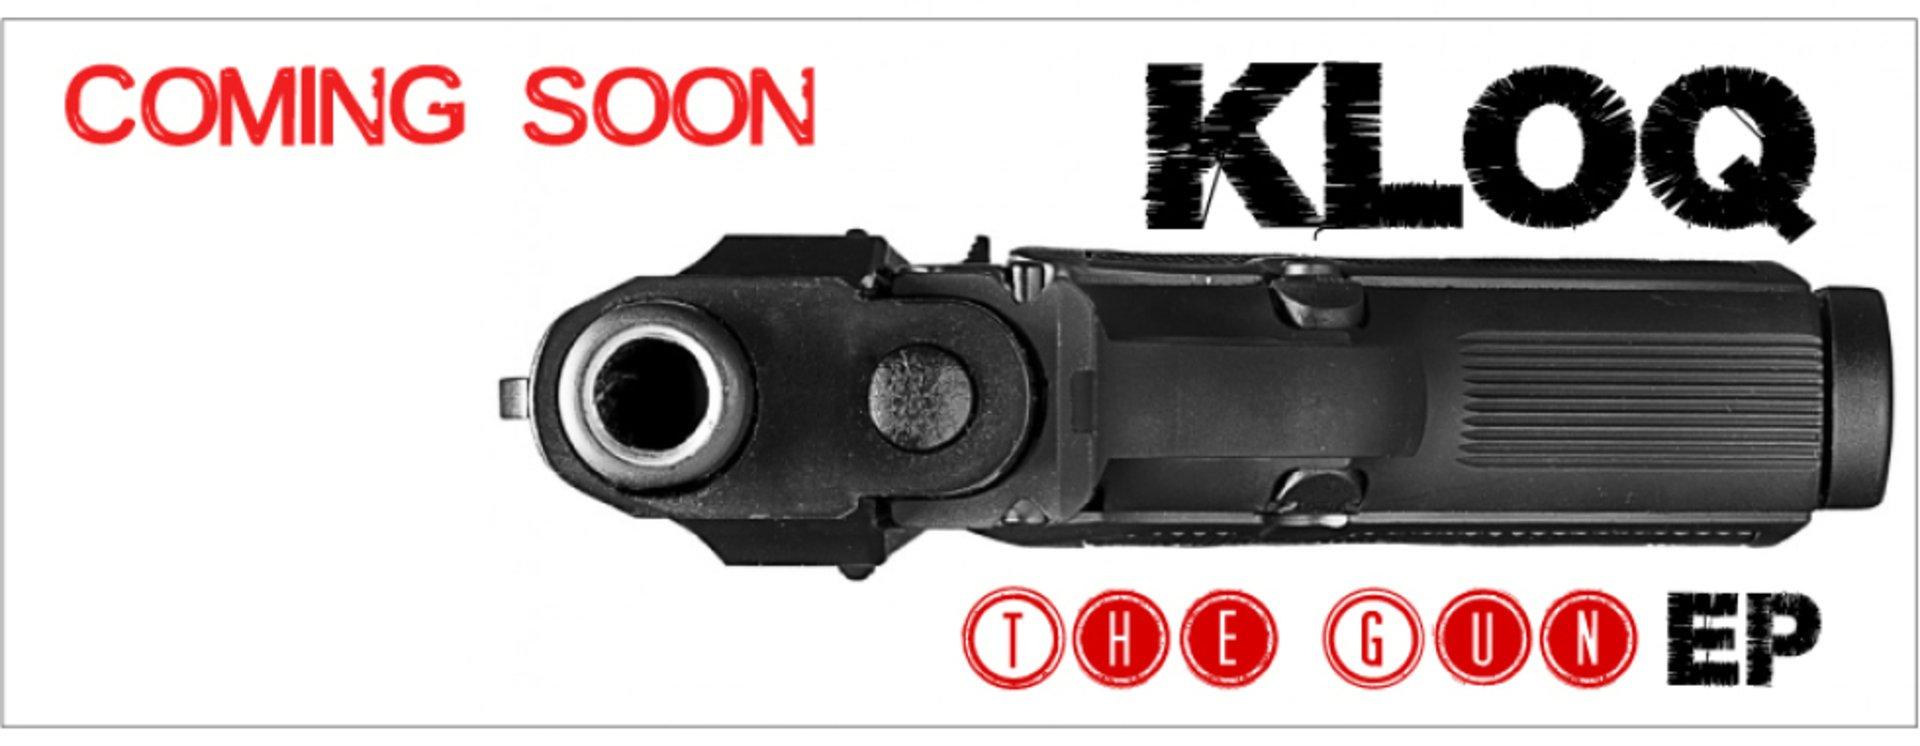 1435257119 gun coming soon panel copy